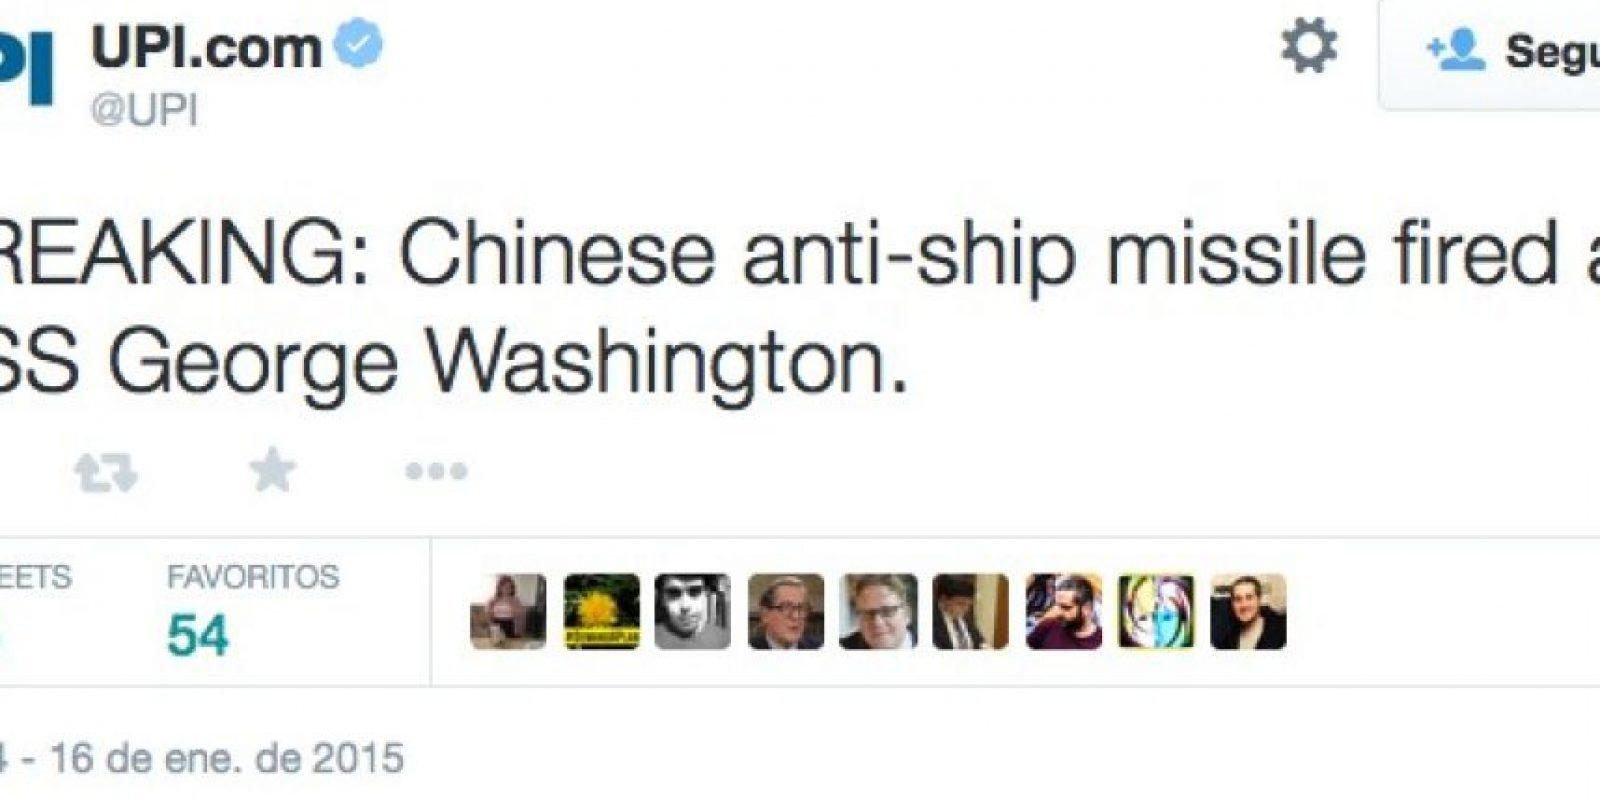 Último momento: Misil chino antibuques disparado en contra del USS George Washington Foto:Twitter